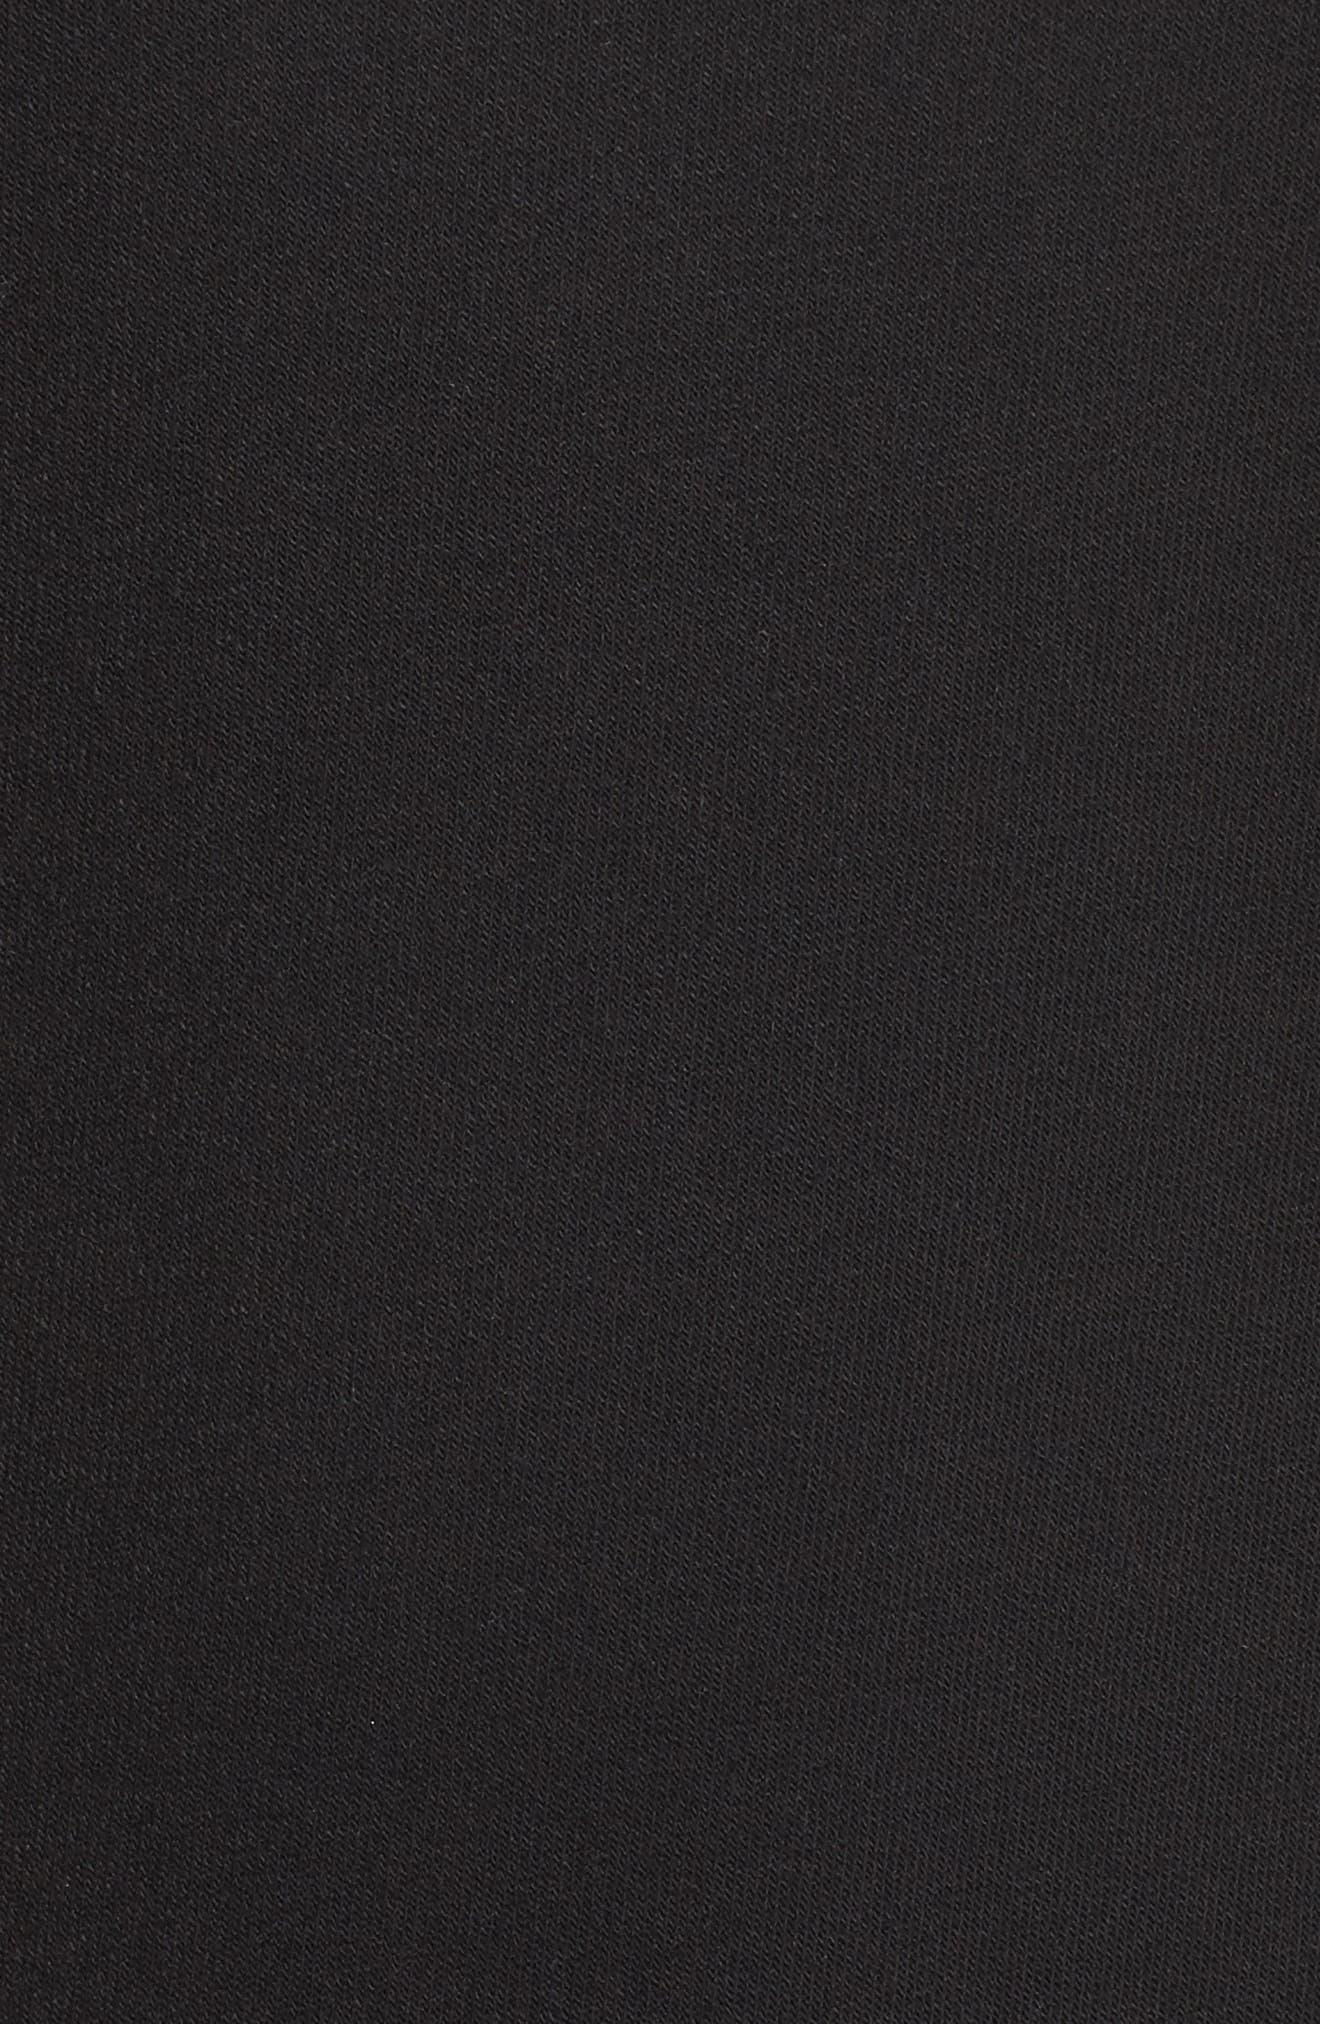 Lattice Long Sleeve Pullover,                             Alternate thumbnail 6, color,                             Black